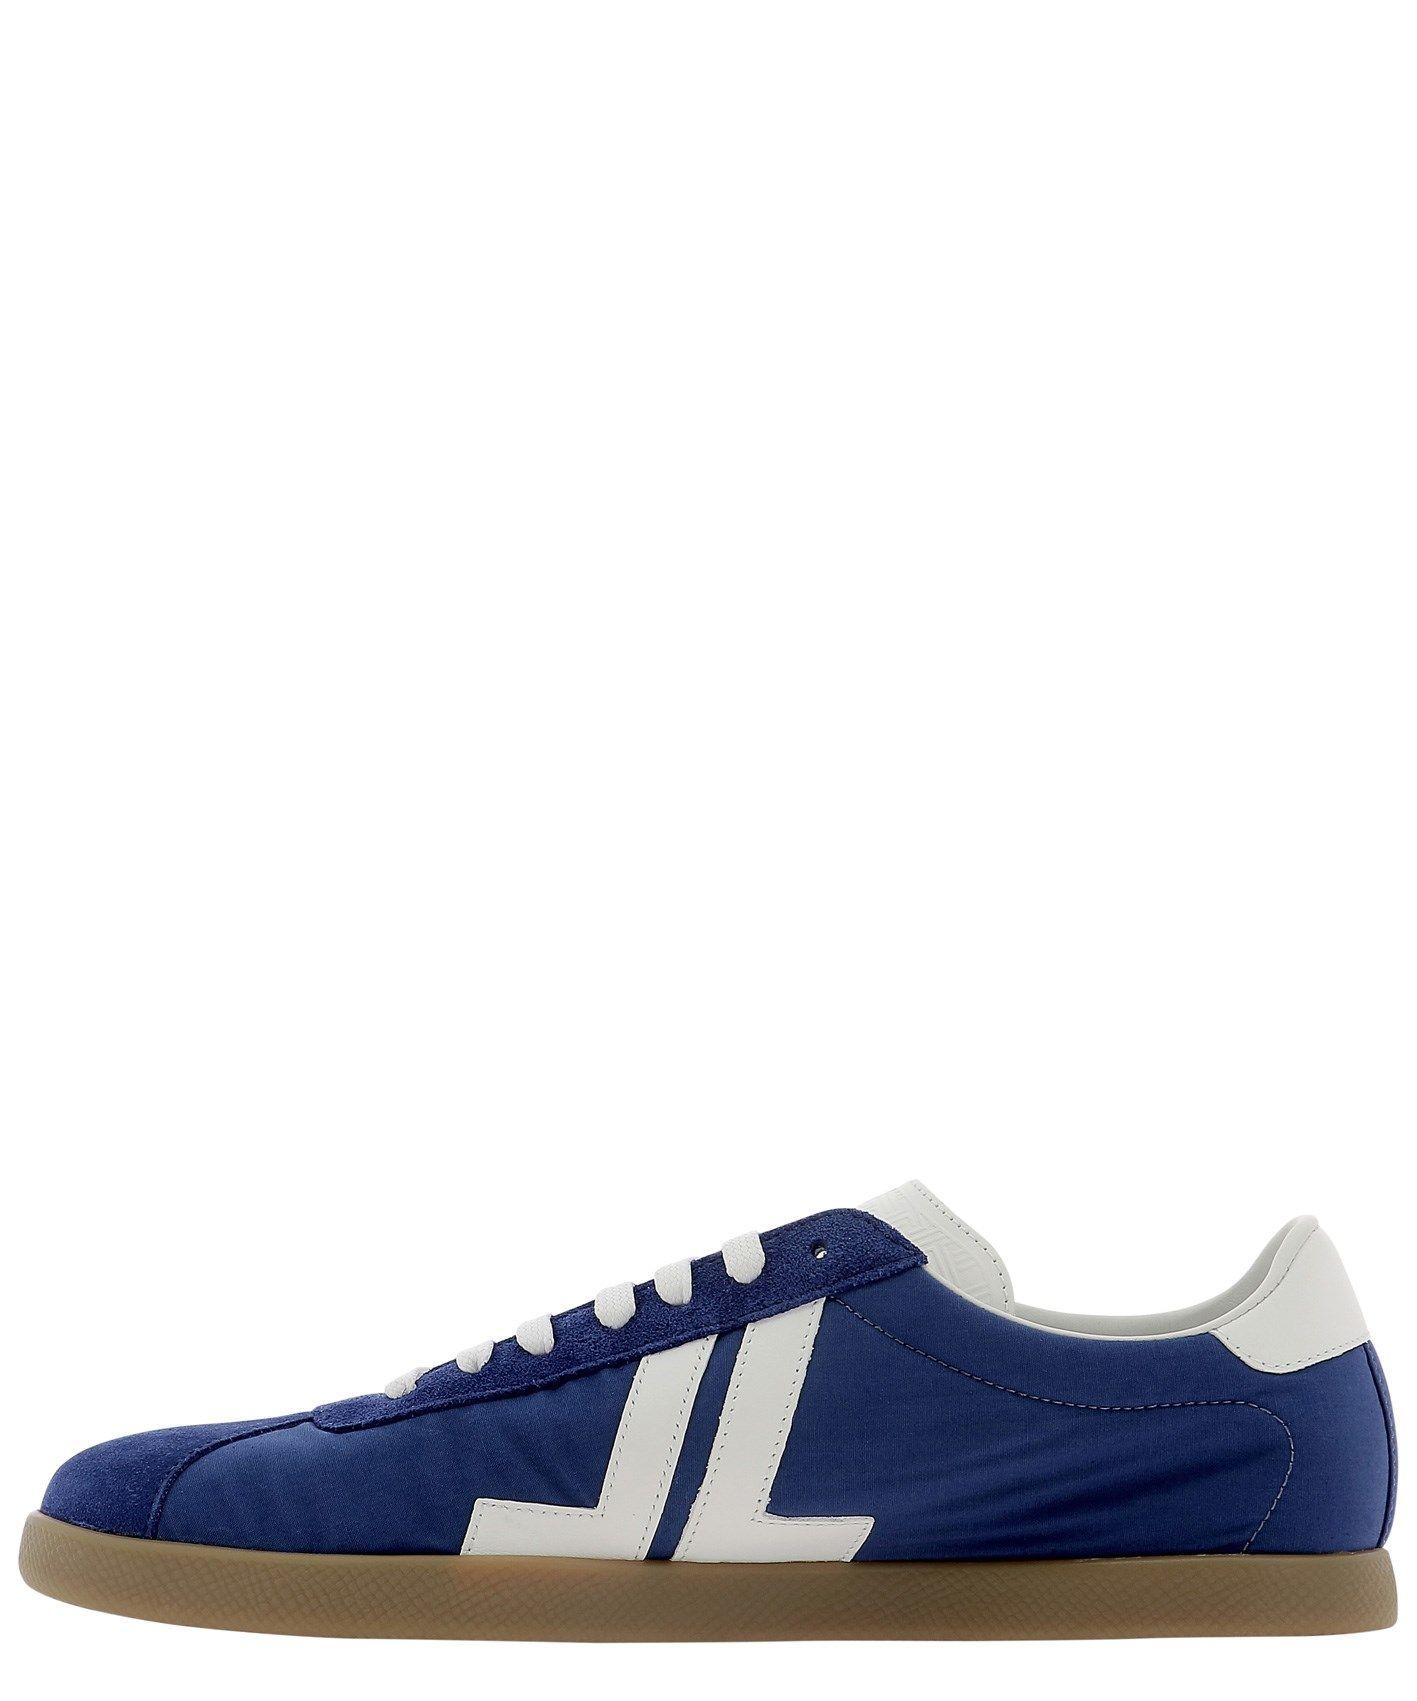 LANVIN Sneakers LANVIN MEN'S BLUE OTHER MATERIALS SNEAKERS